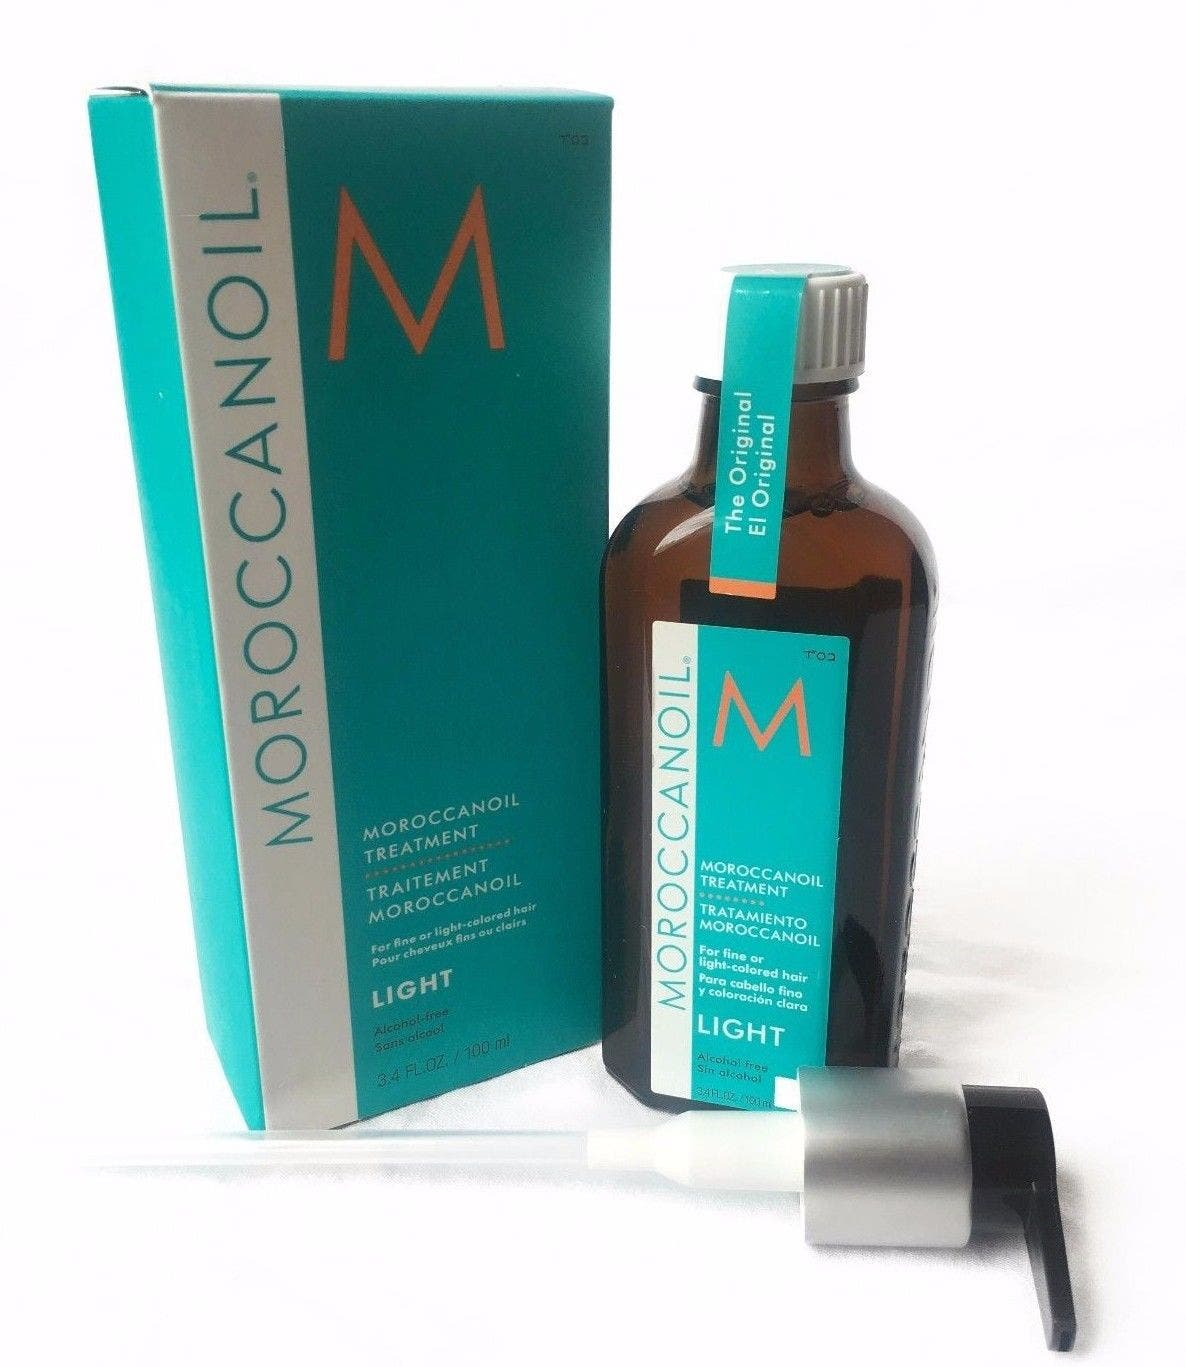 Moroccanoil Light Treatment 100ml for fine or light-colored hair